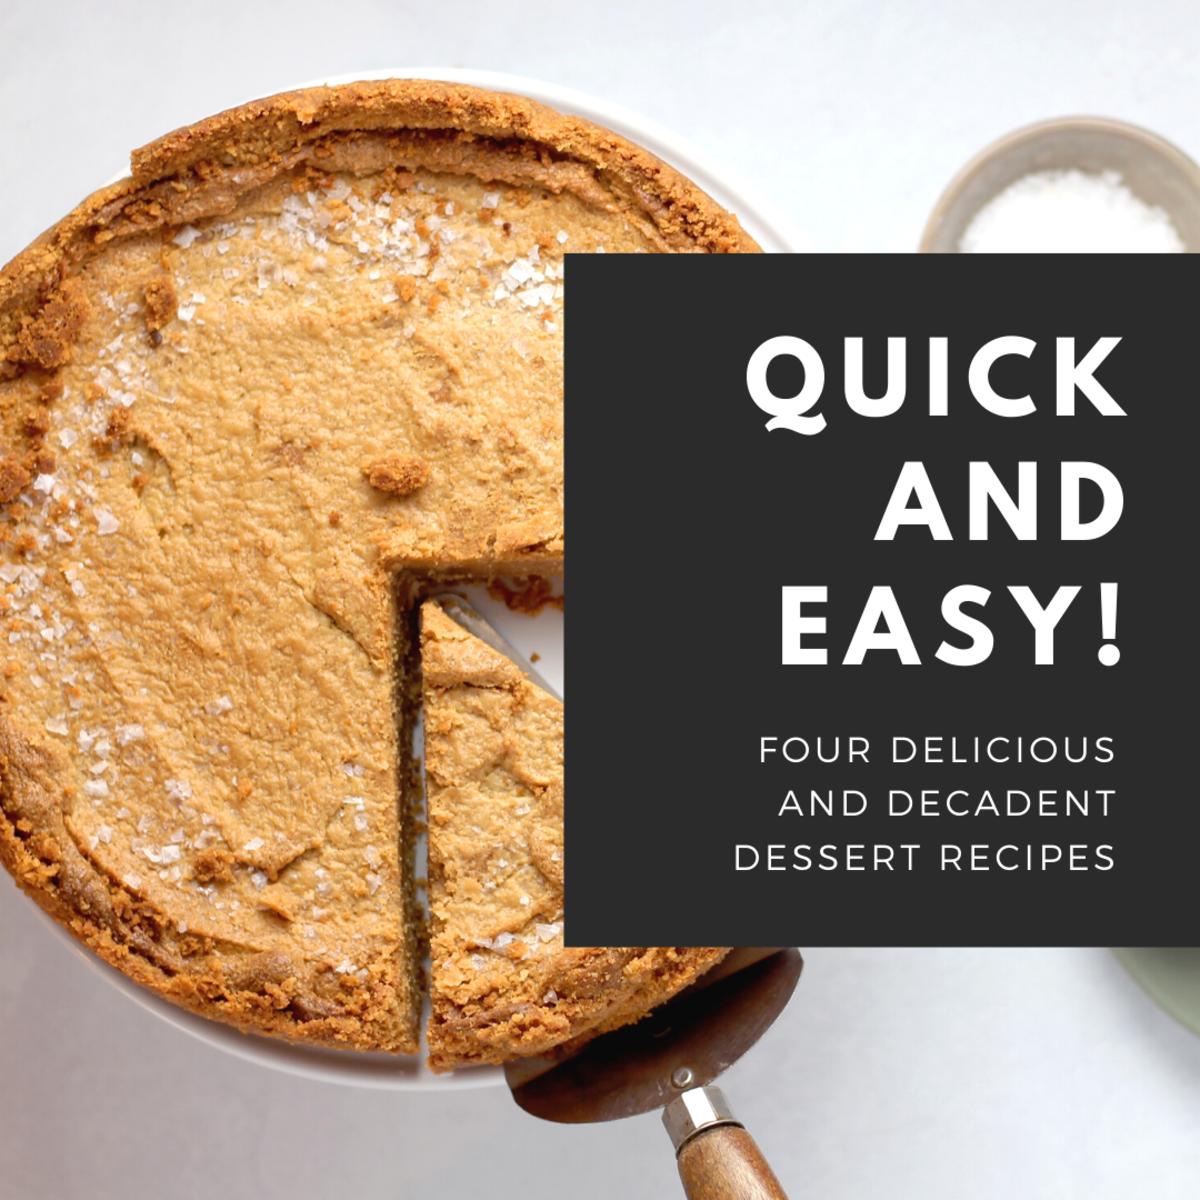 Quick and Easy Dessert Recipes: Pumpkin Cheesecake, Peanut Butter Fudge, Lemon Pie, and Fudge Pie